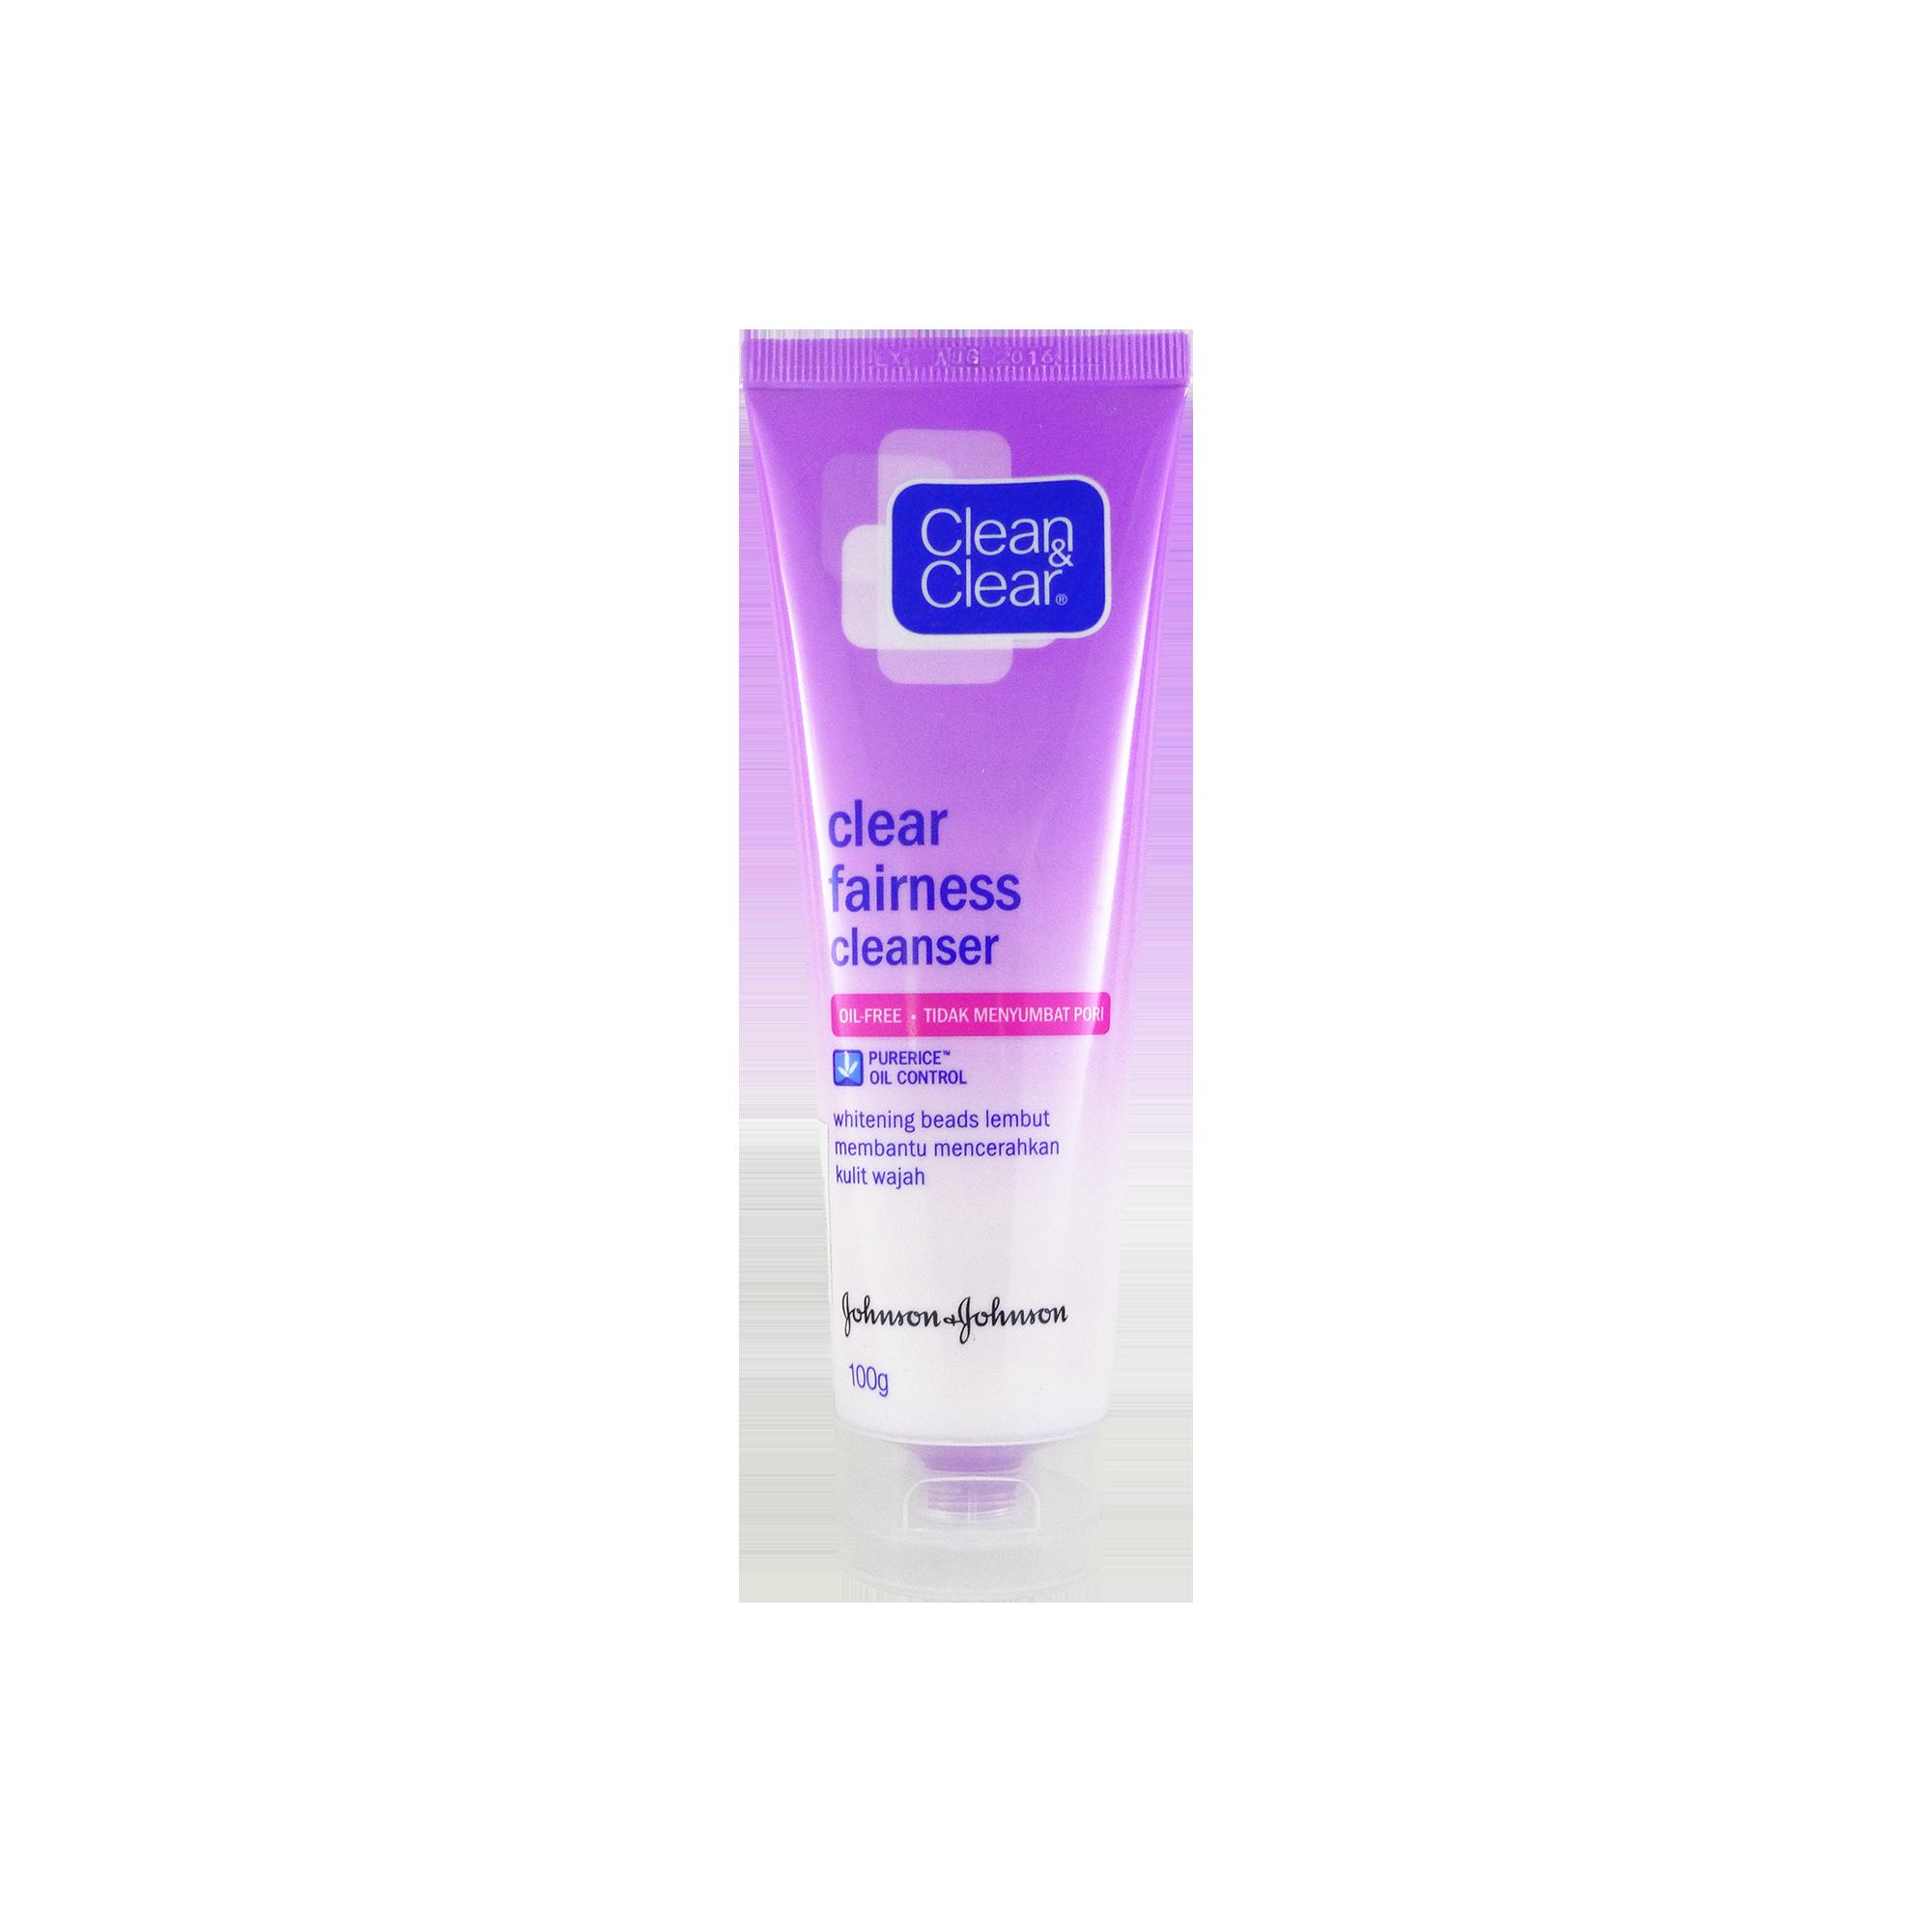 Clean Clear Fairness Face Wash Review Cream Pemutih Badan Body Gold Mouthshut Score